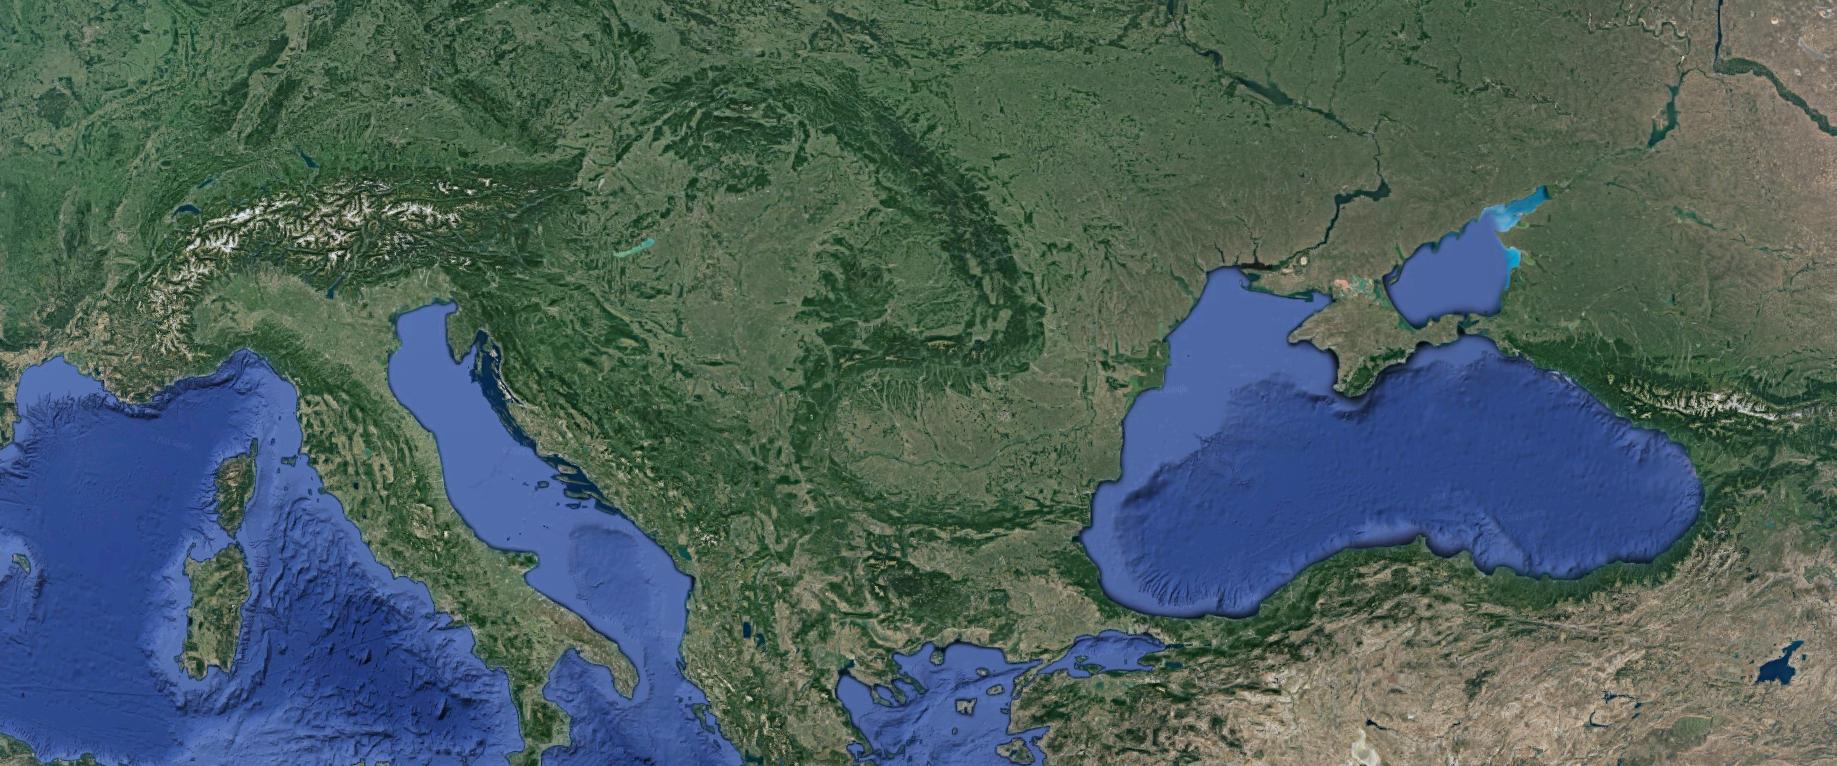 Lower Danube River Basin Regional Hub